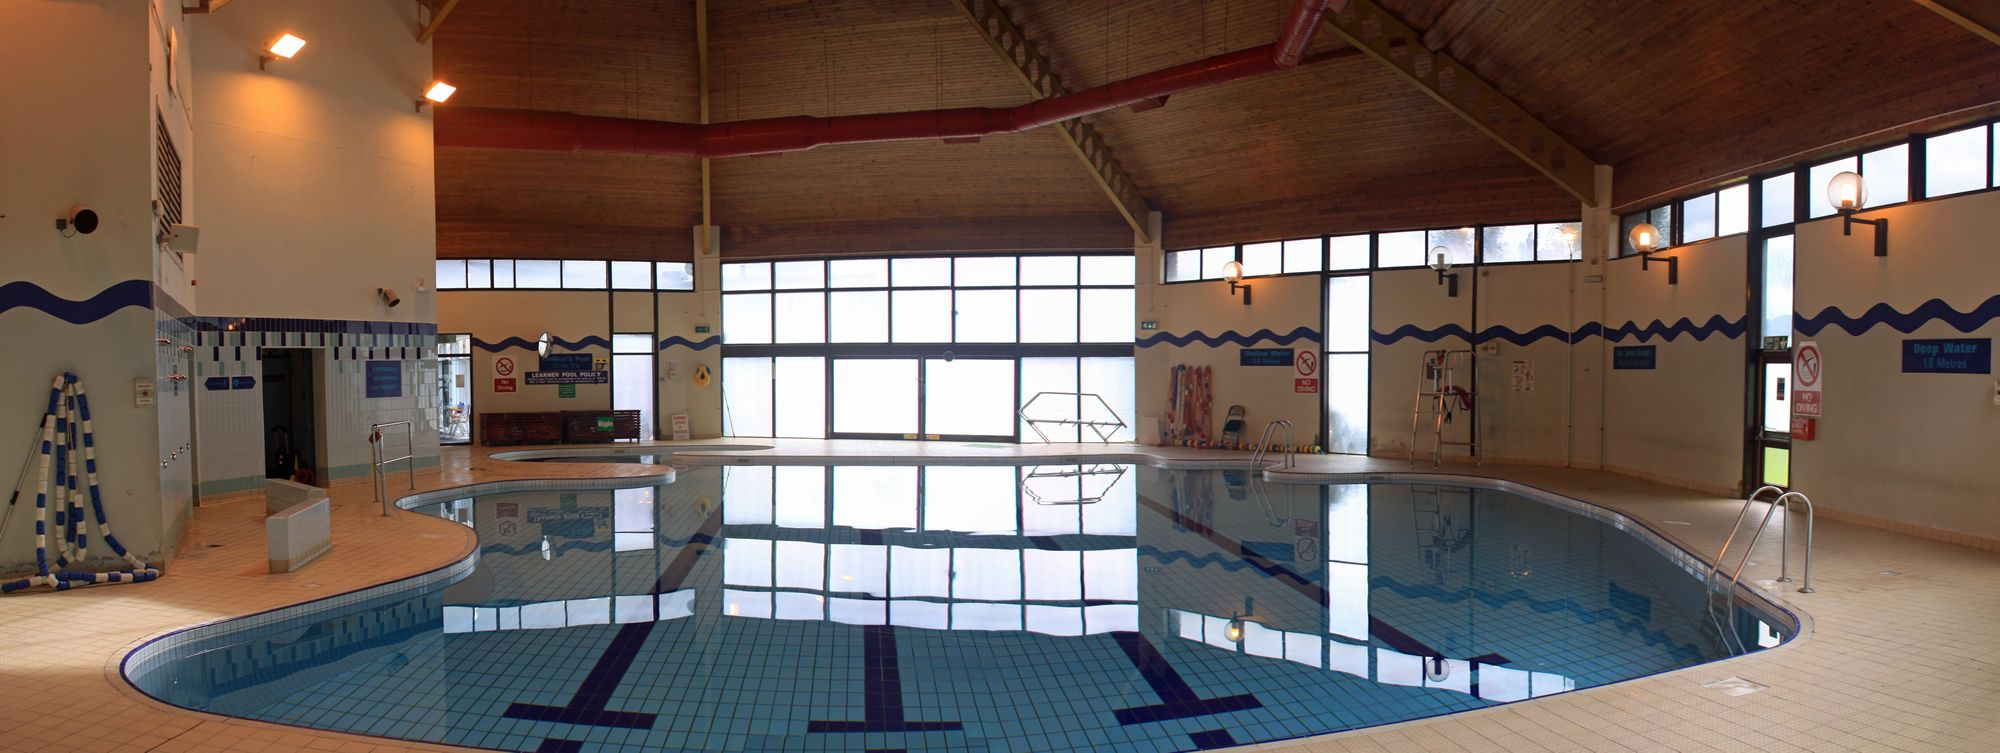 The Pool Leisure center, Pool, Leisure